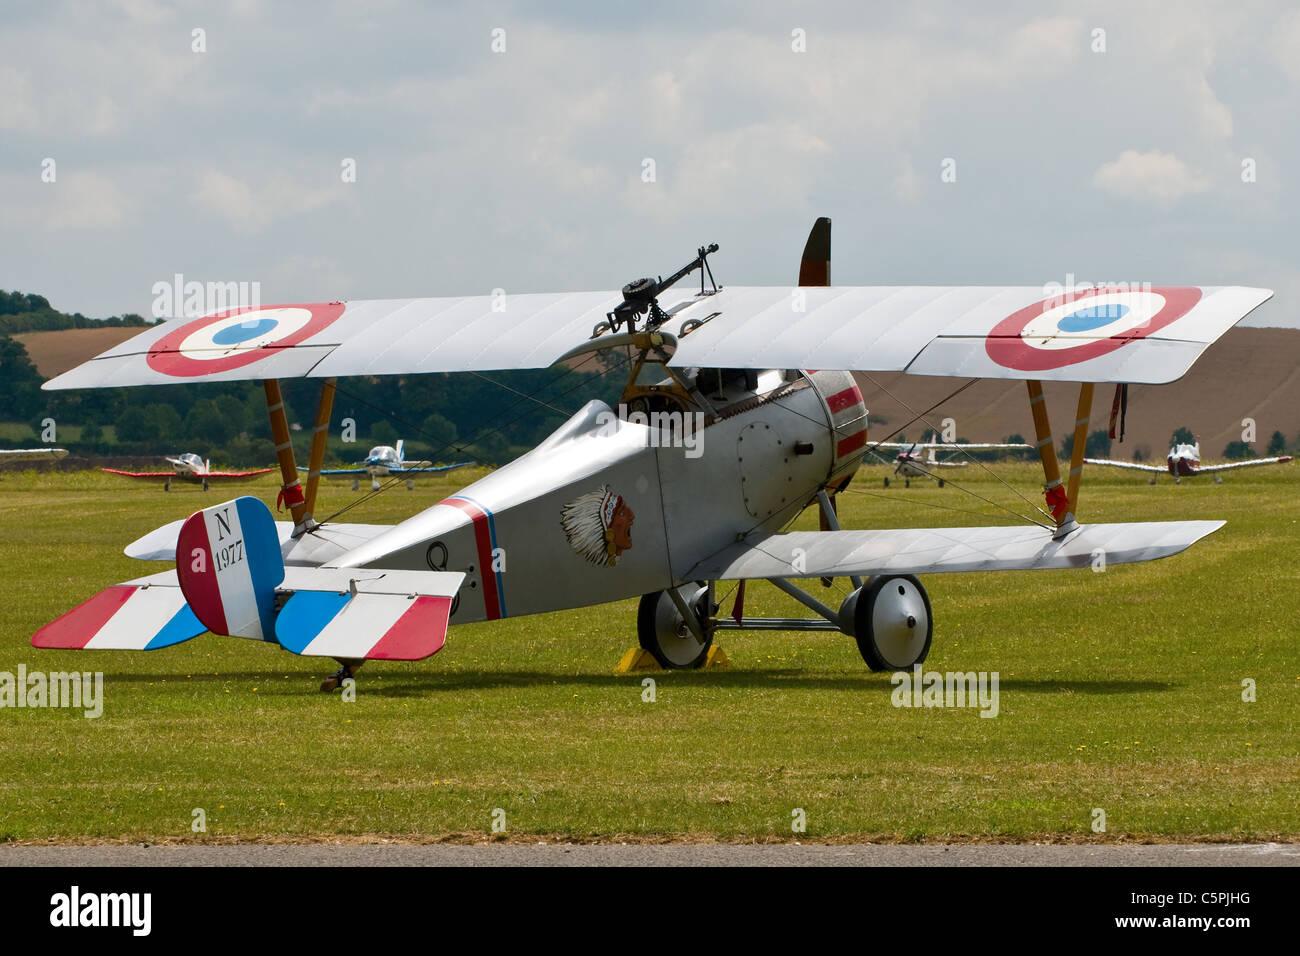 Nieuport 17 bi-plane N 1977 from the first World war Stock Photo